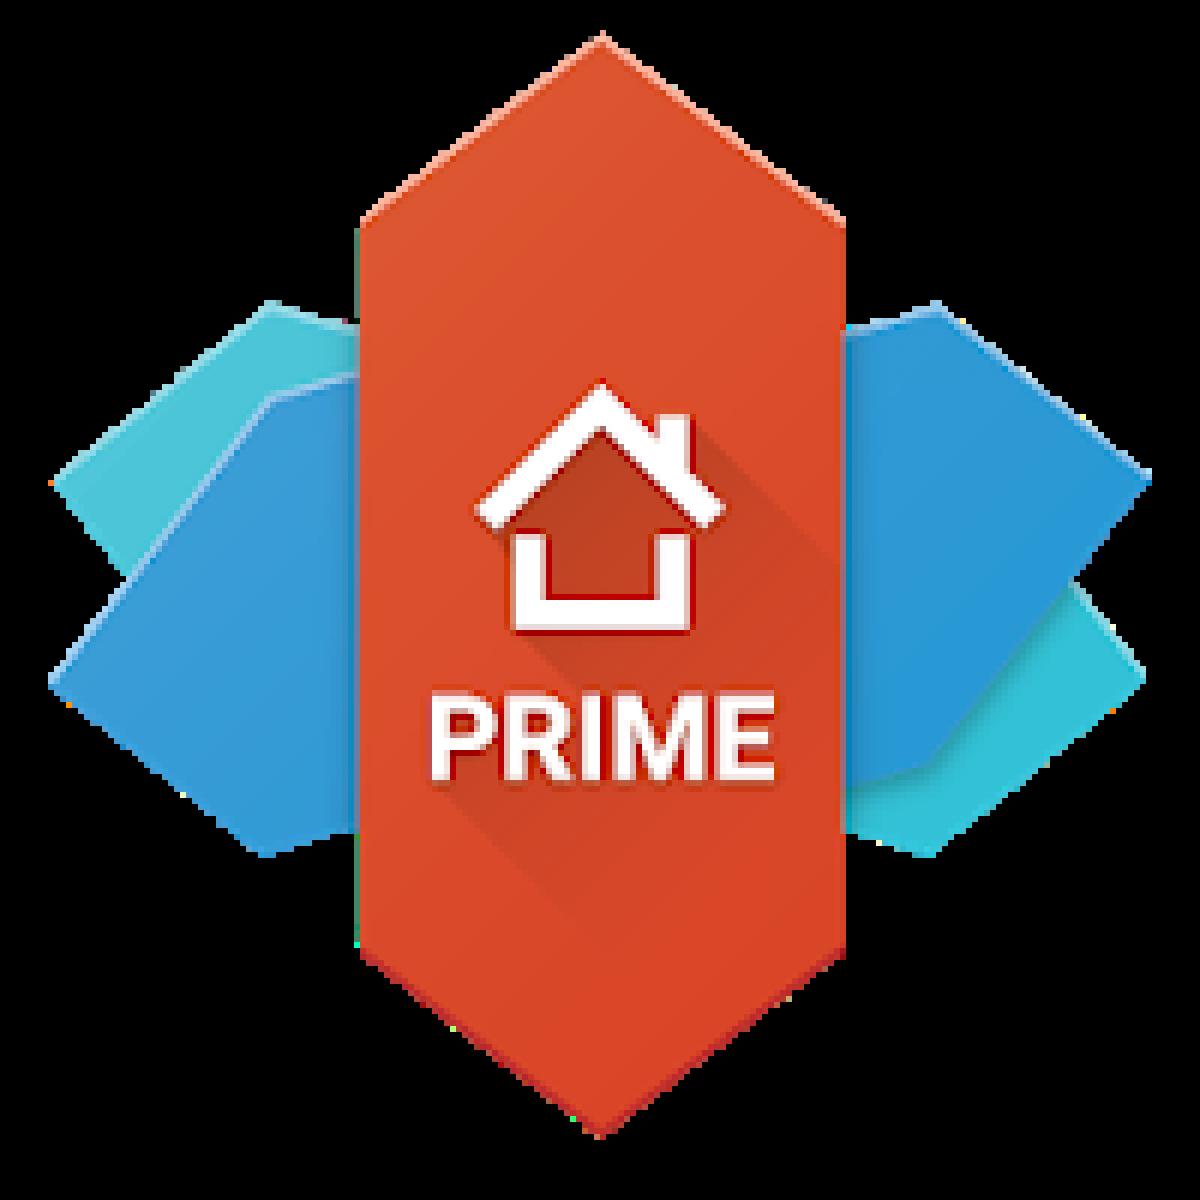 Nova Launcher Prime Mod Apk 7 0 22 Download Premium For Android